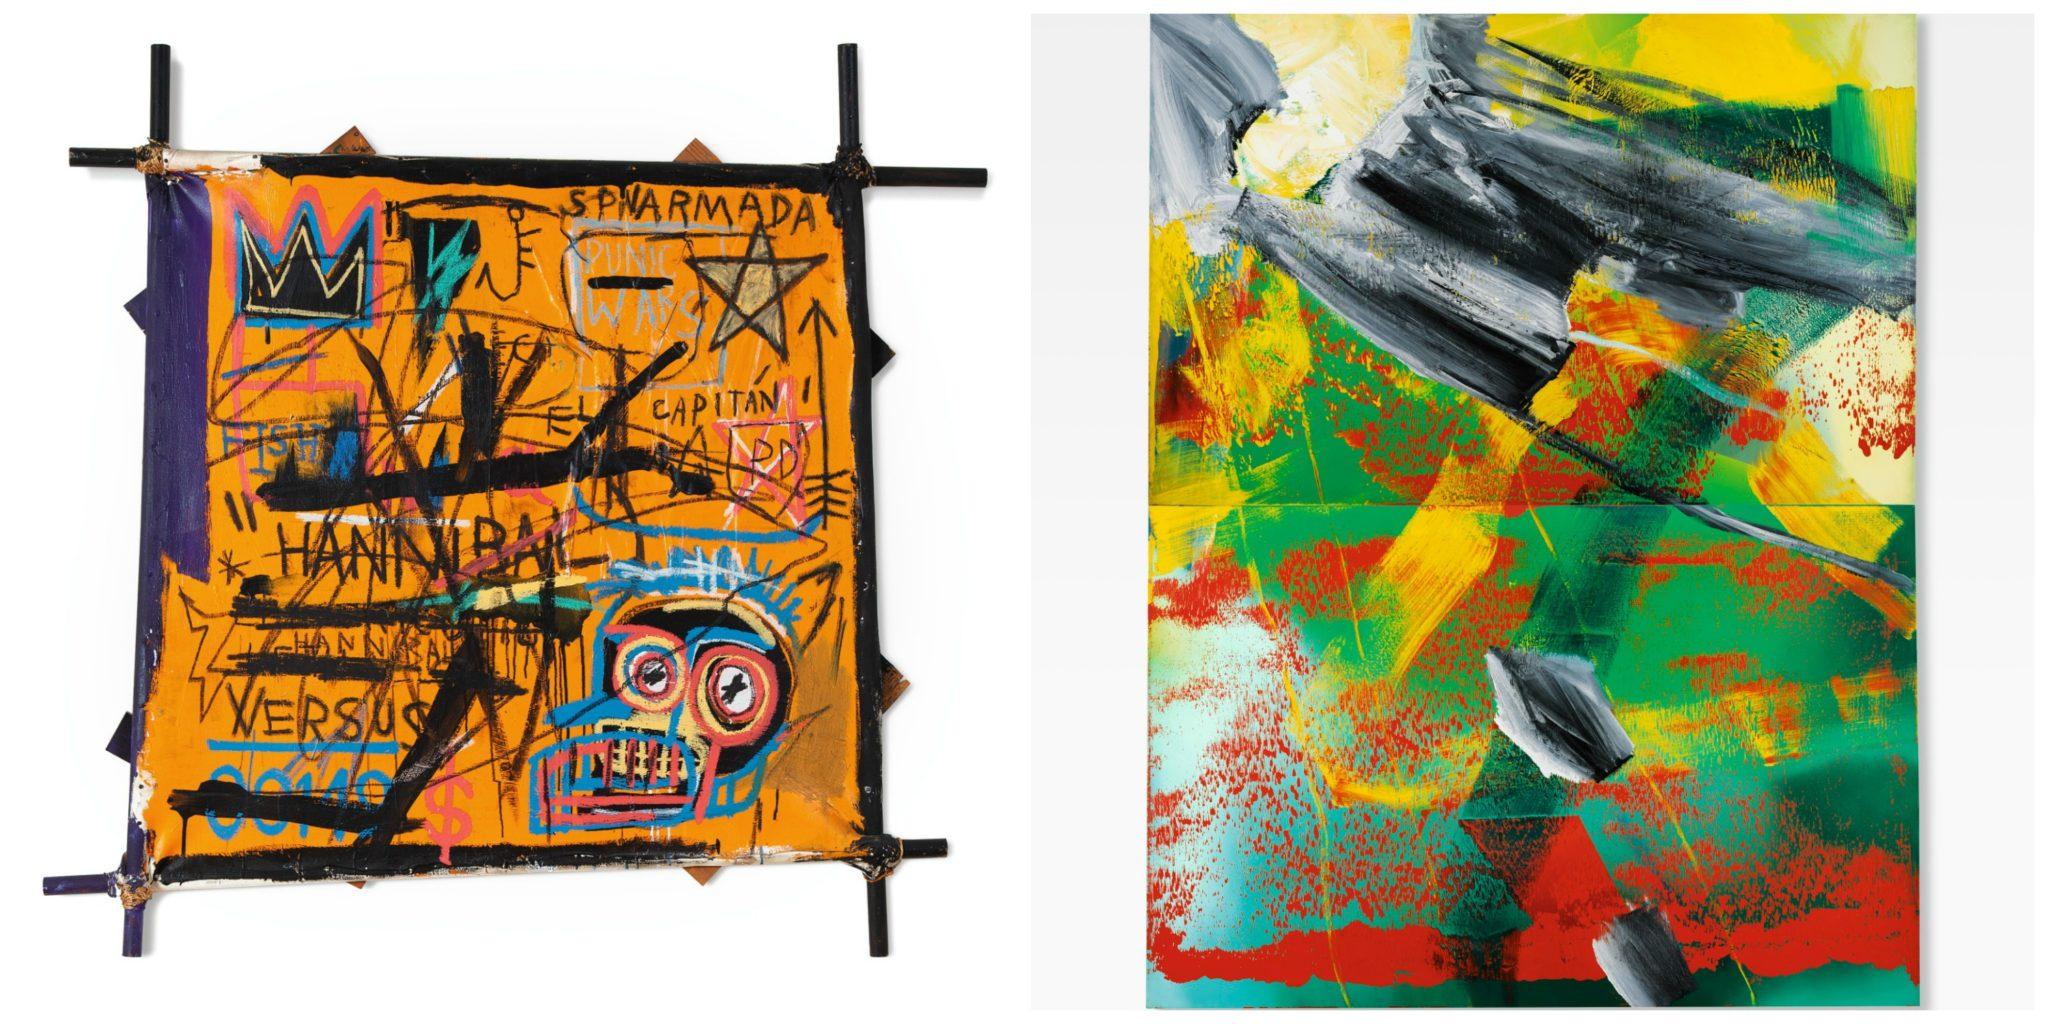 71,3 milioni£ da Sotheby's a Londra. Richter e Basquiat volano